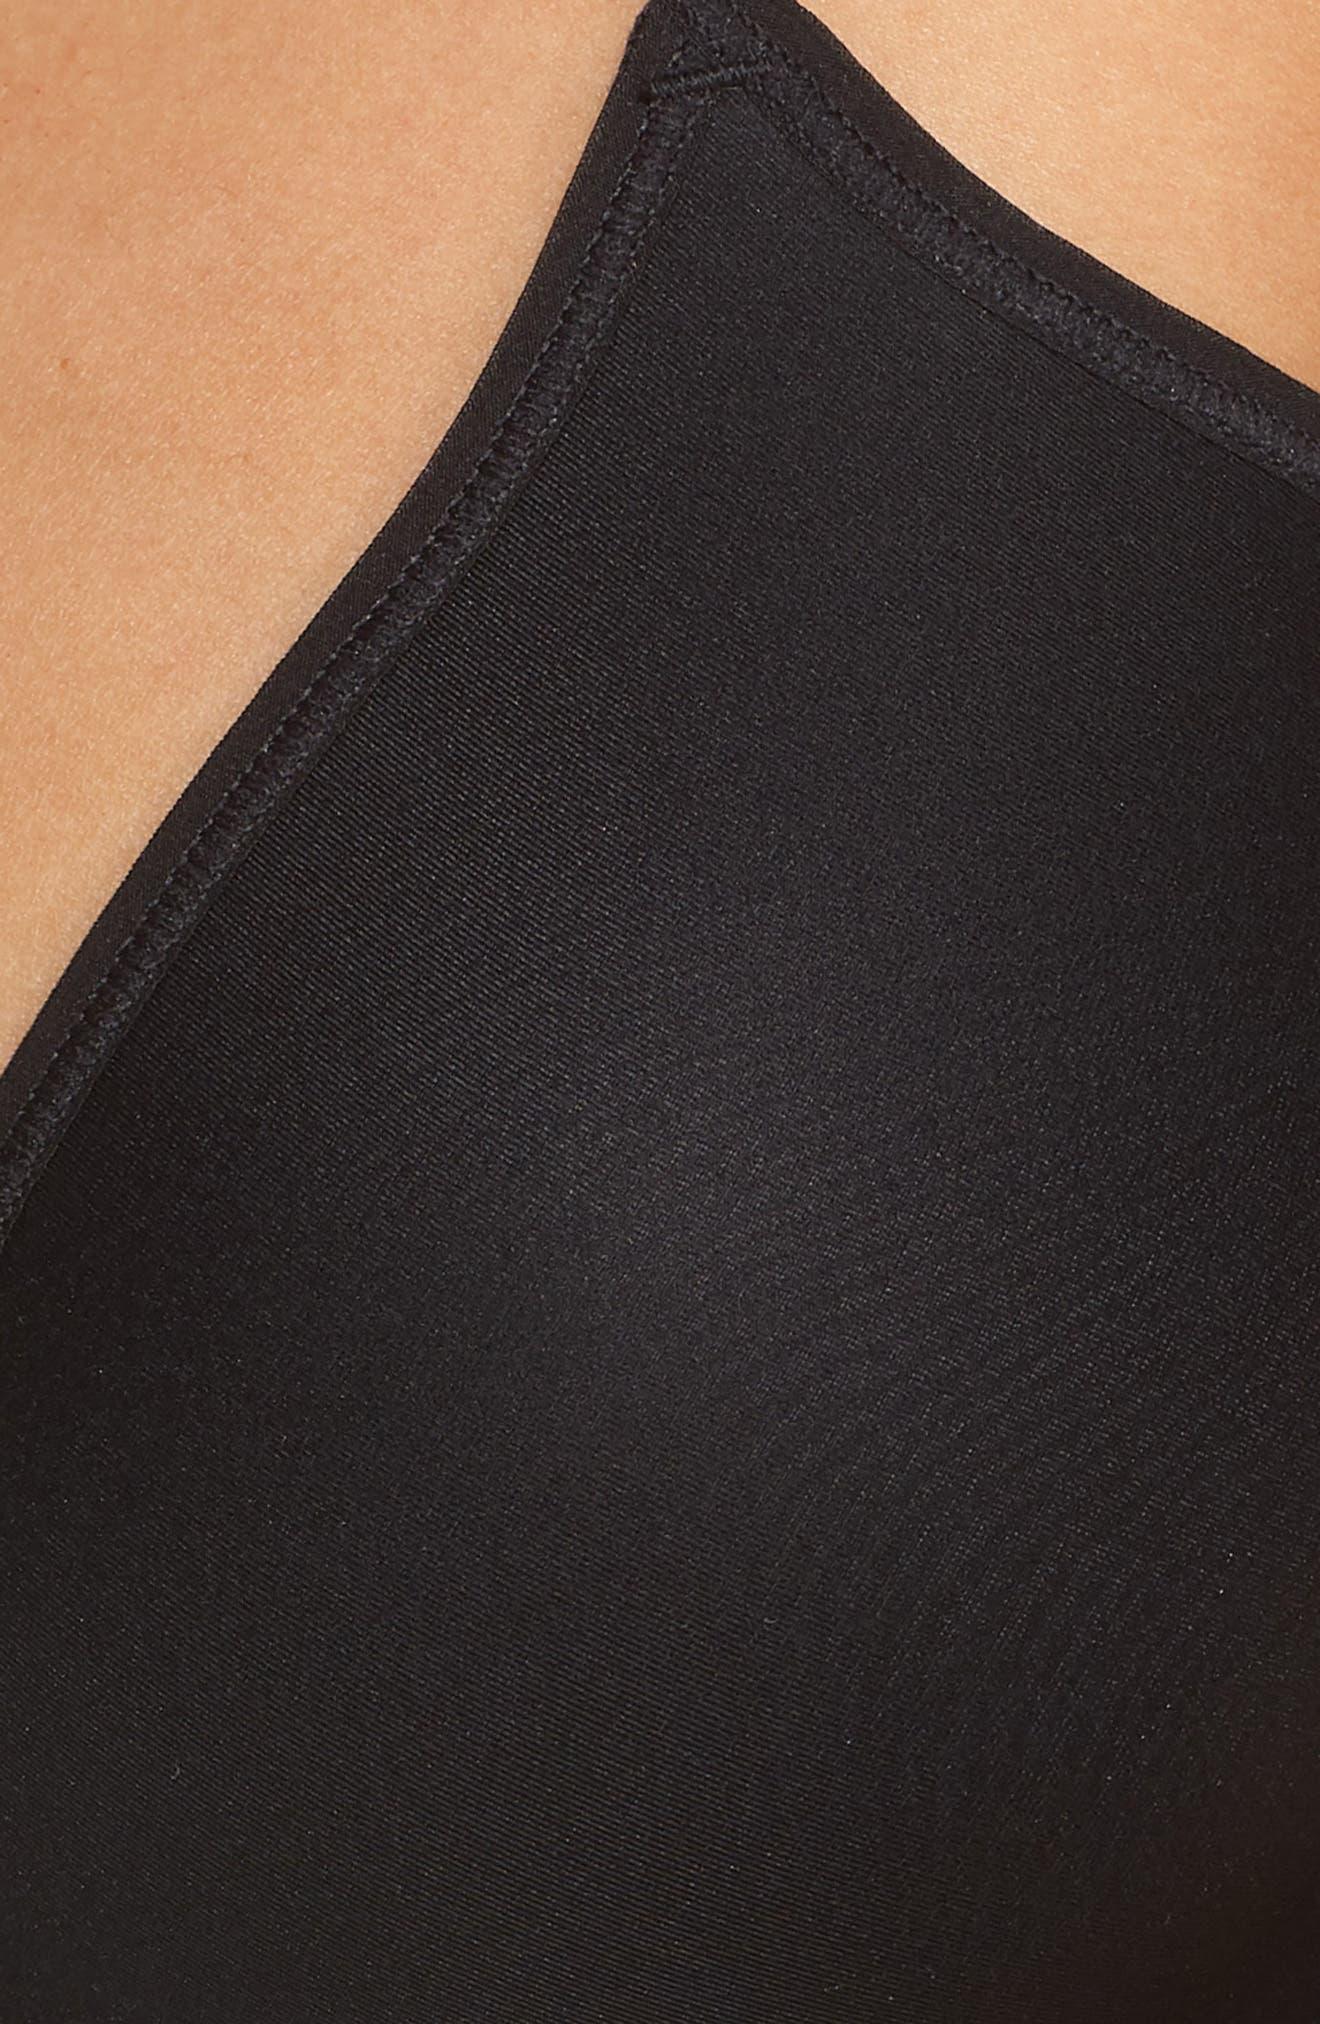 ON GOSSAMER,                             Next to Nothing Underwire T-Shirt Bra,                             Alternate thumbnail 6, color,                             BLACK